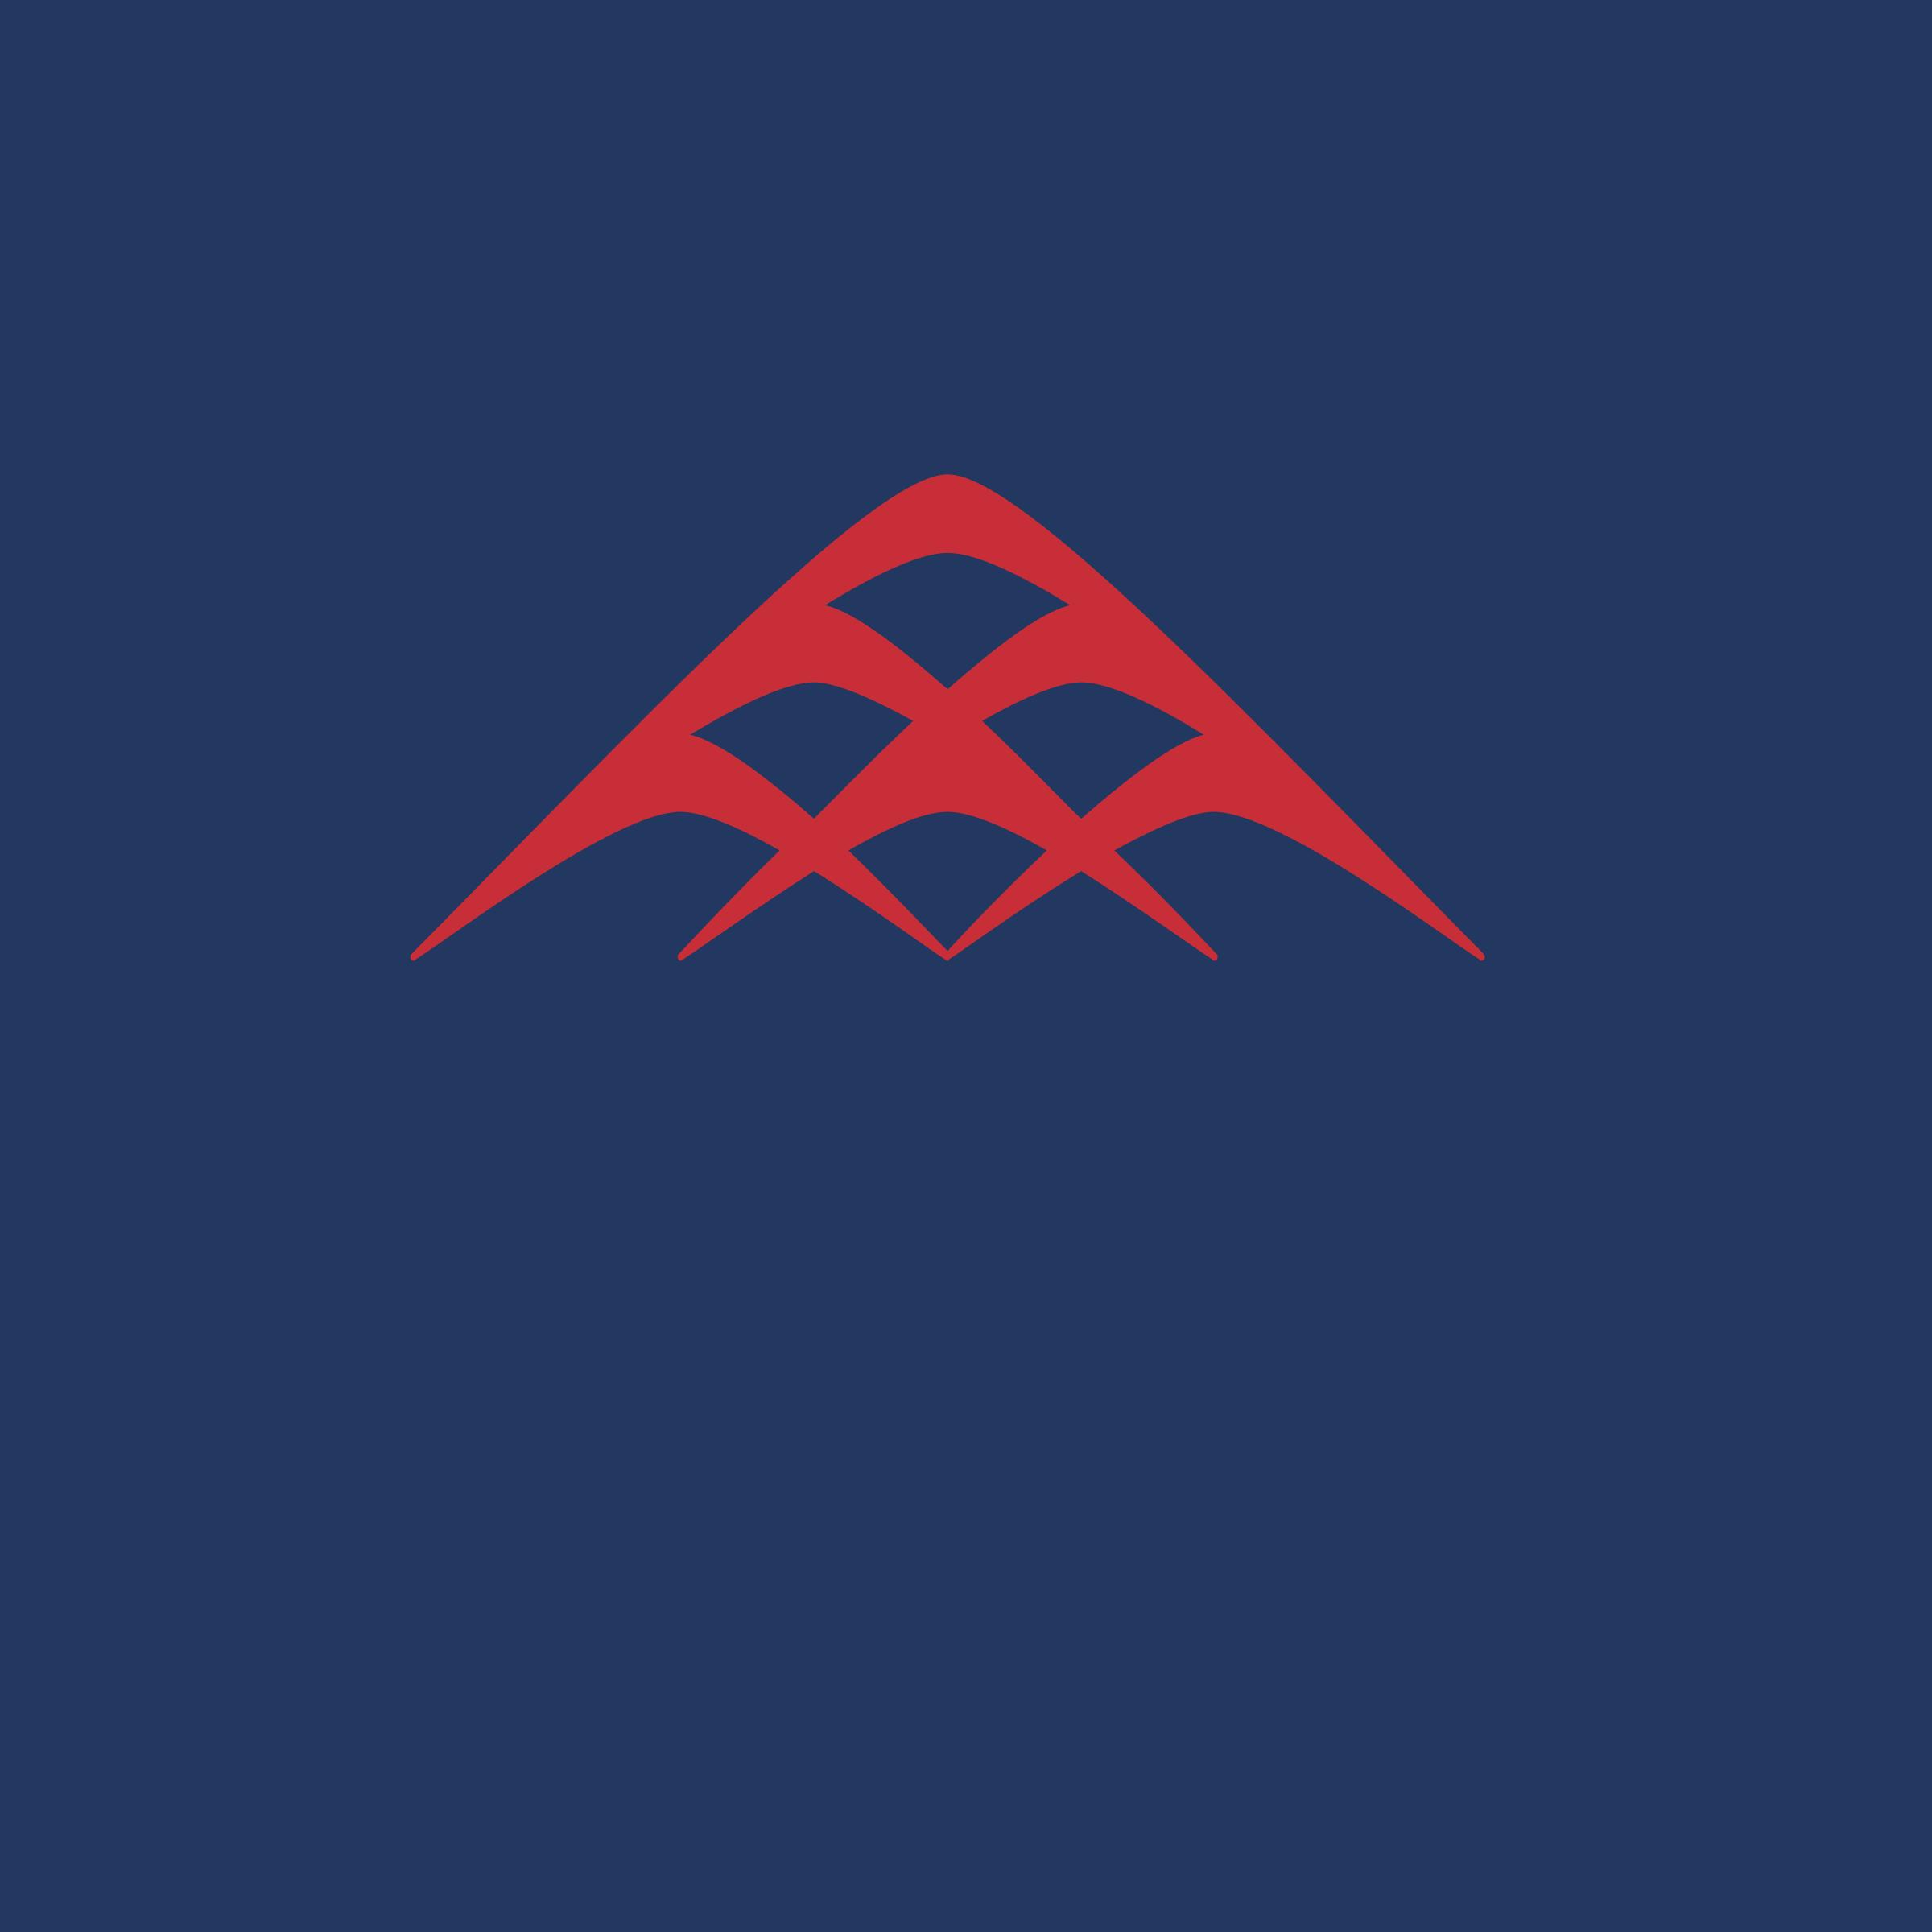 Ariba Logo PNG Transparent & SVG Vector.